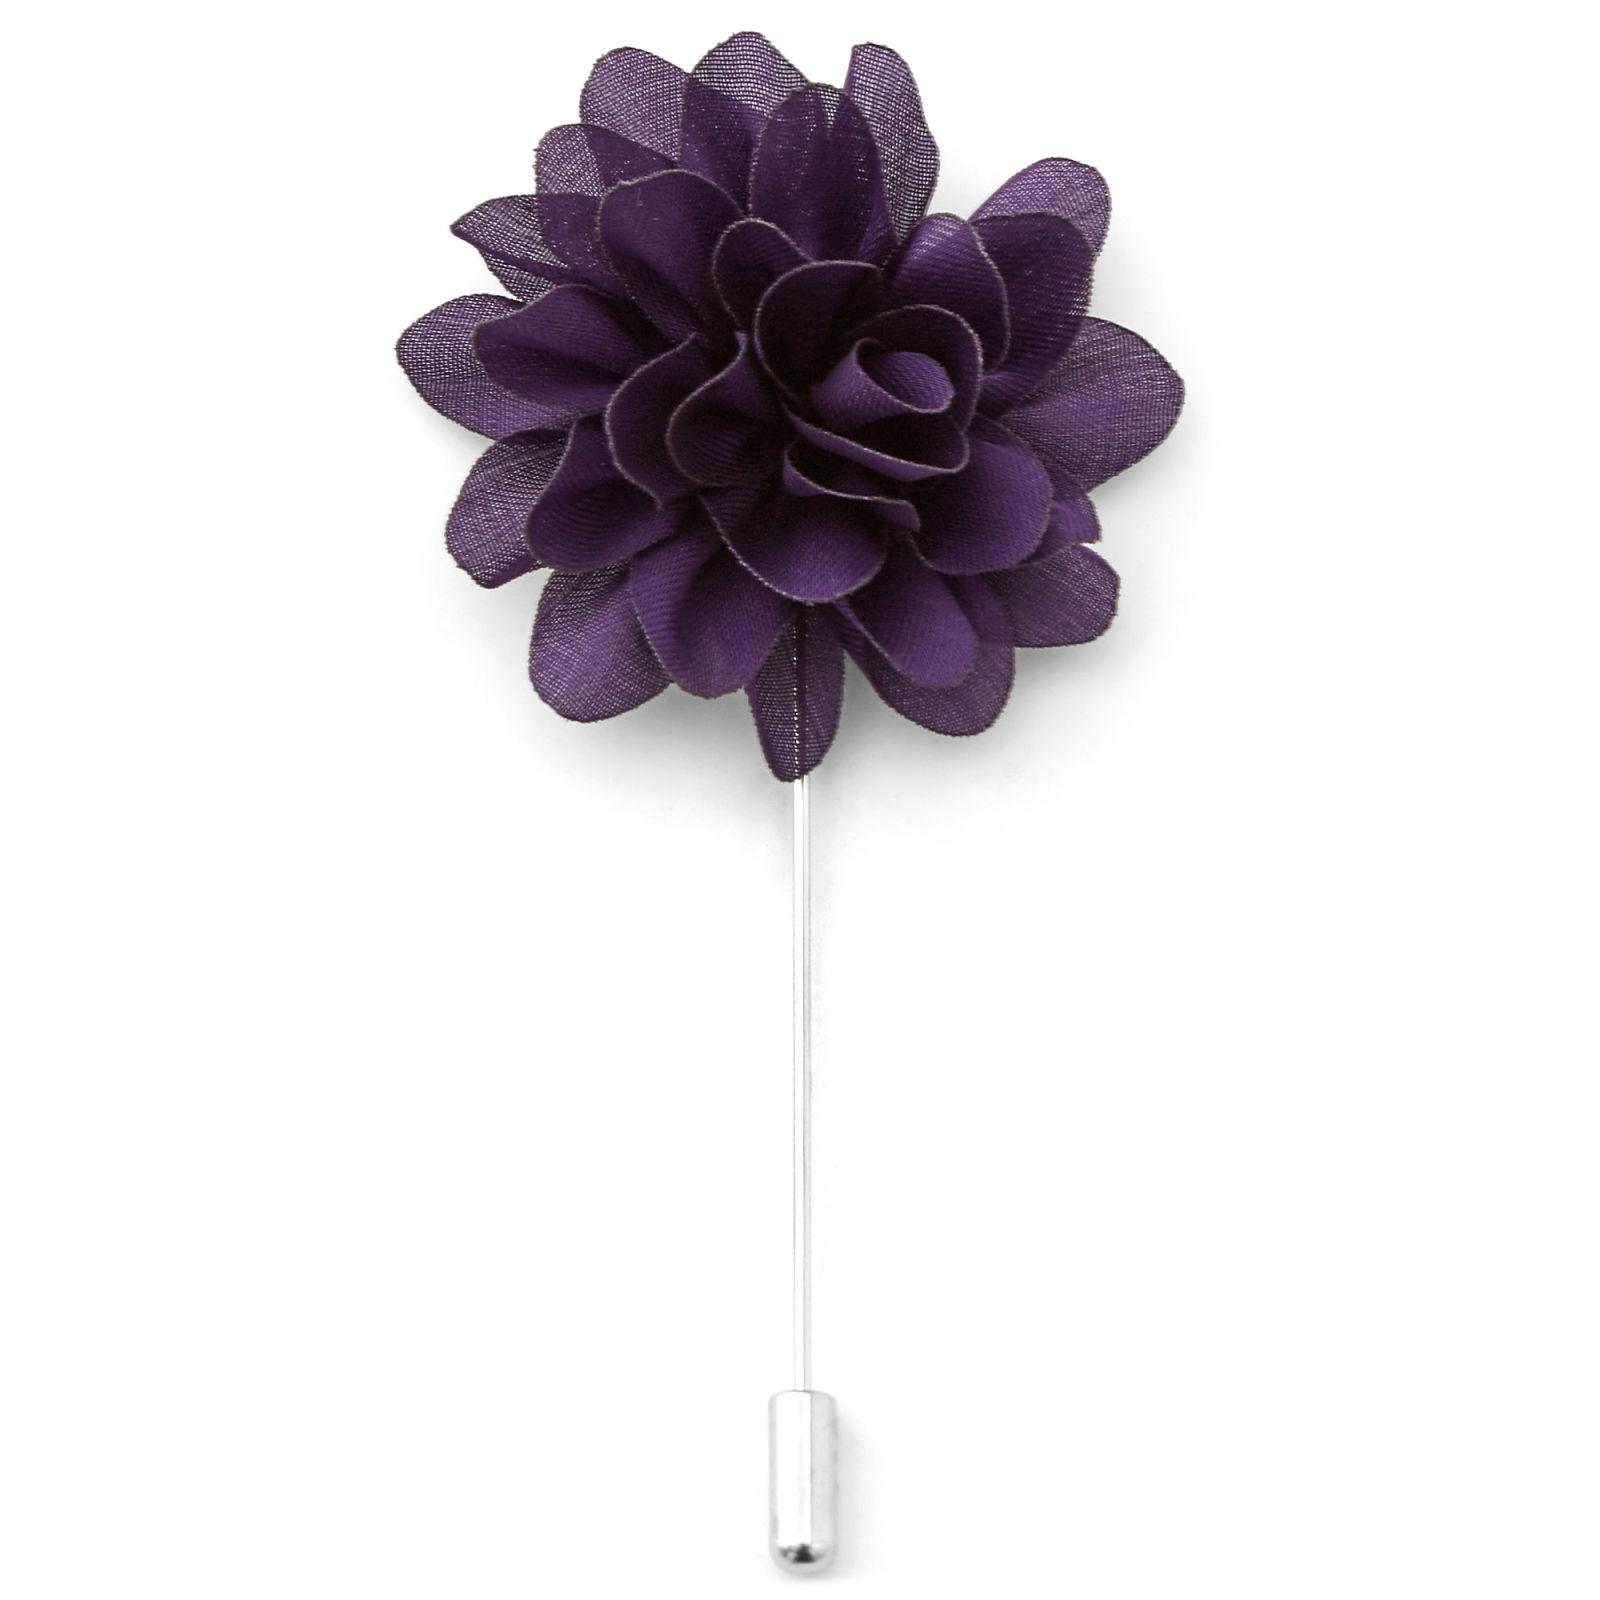 Creative Pink Lapel Flower Trendhim Kv72e7